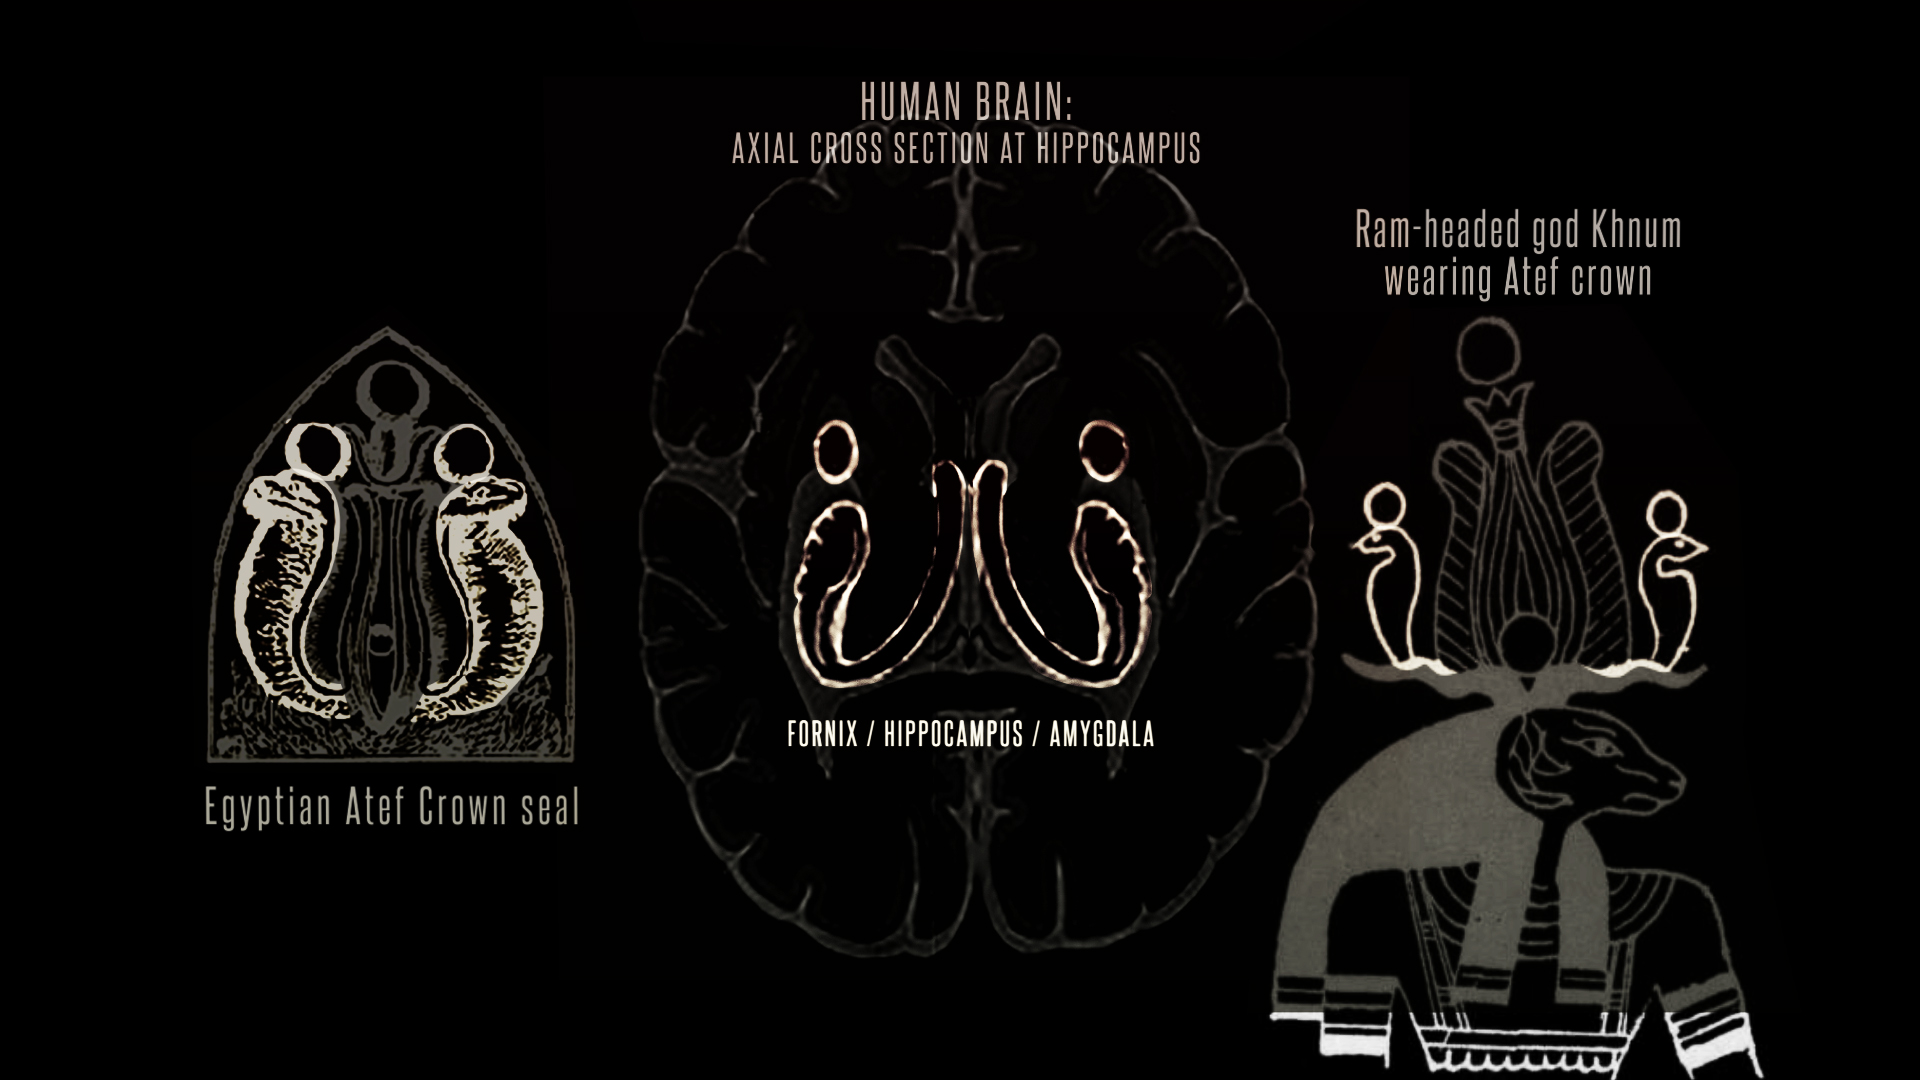 Brain Atef amygdala khnum triple comparison.jpg